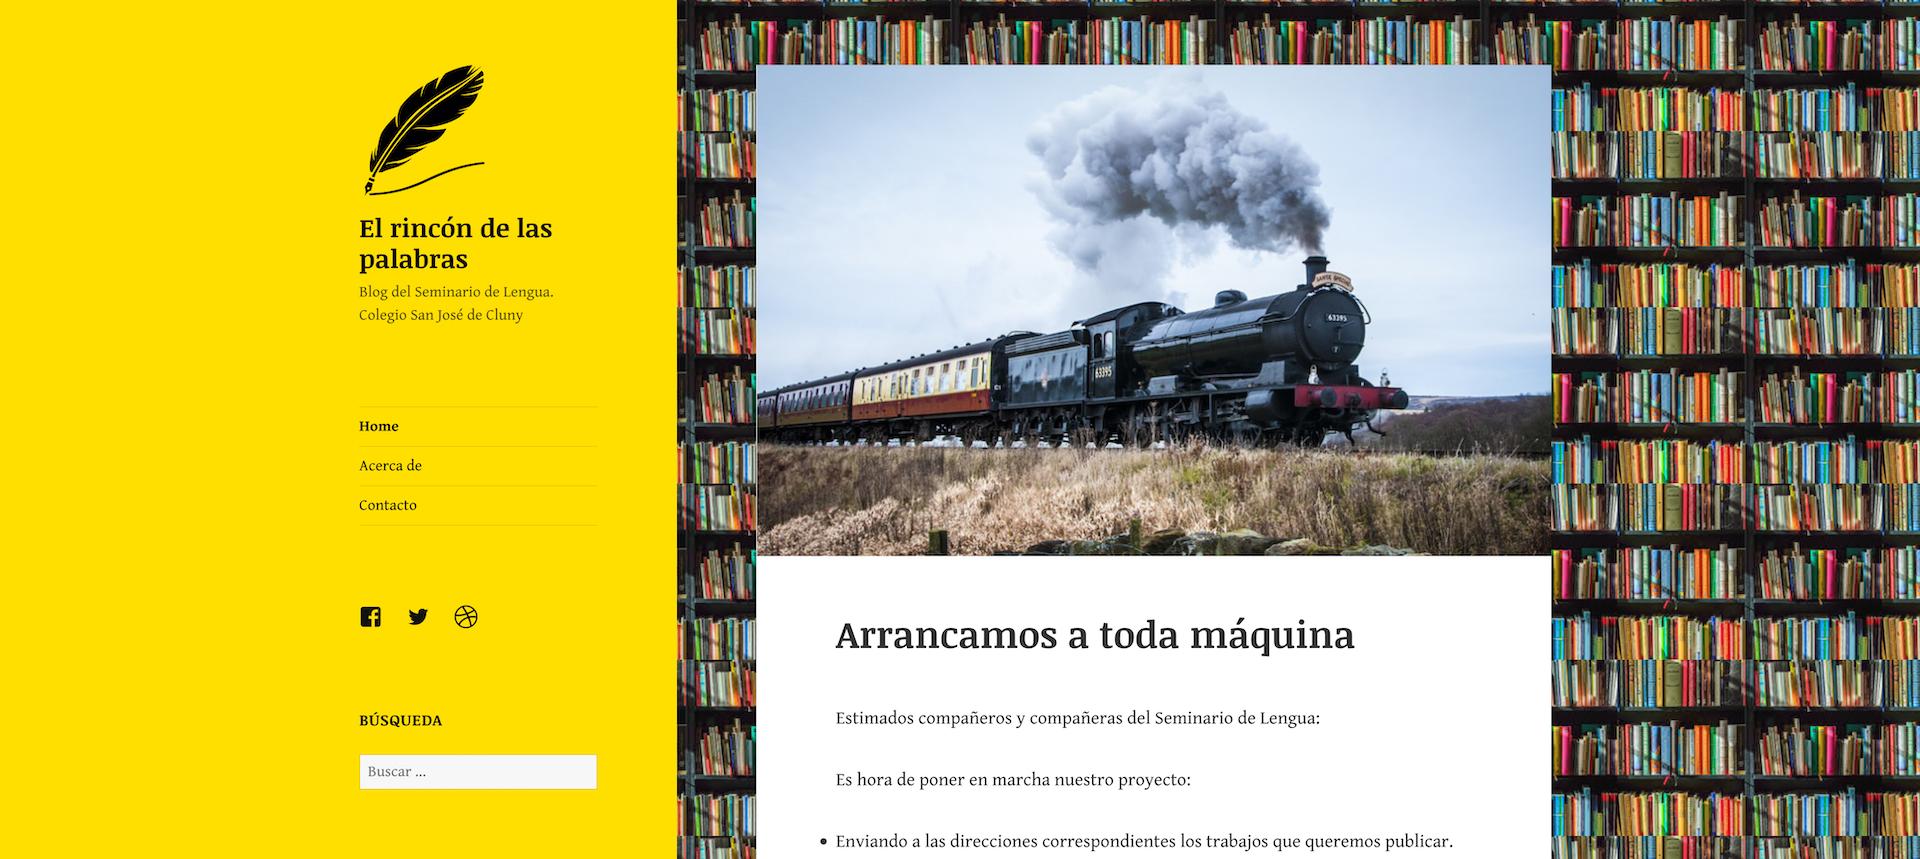 blogcluny_rincóndelaspalabras